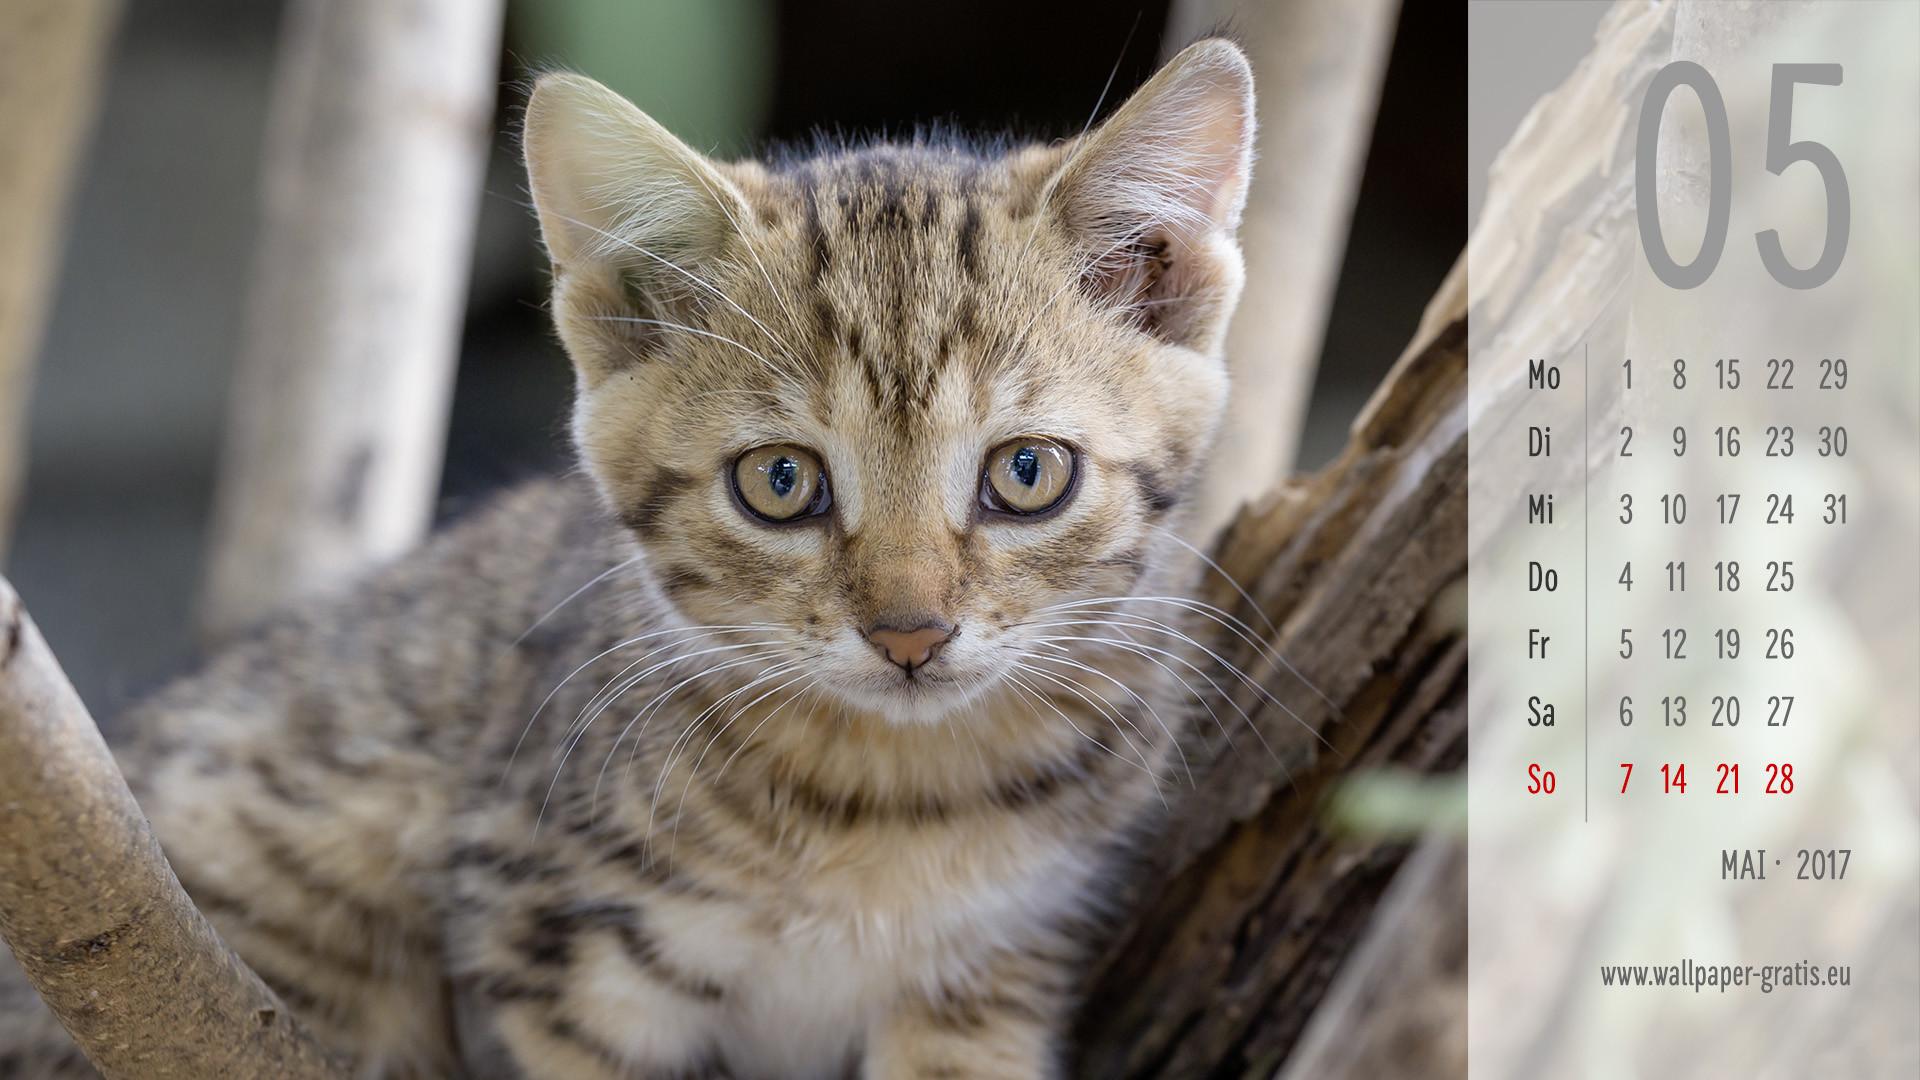 Cute Cat Iphone 6 Wallpaper Die 71 Besten Katzen Hintergrundbilder